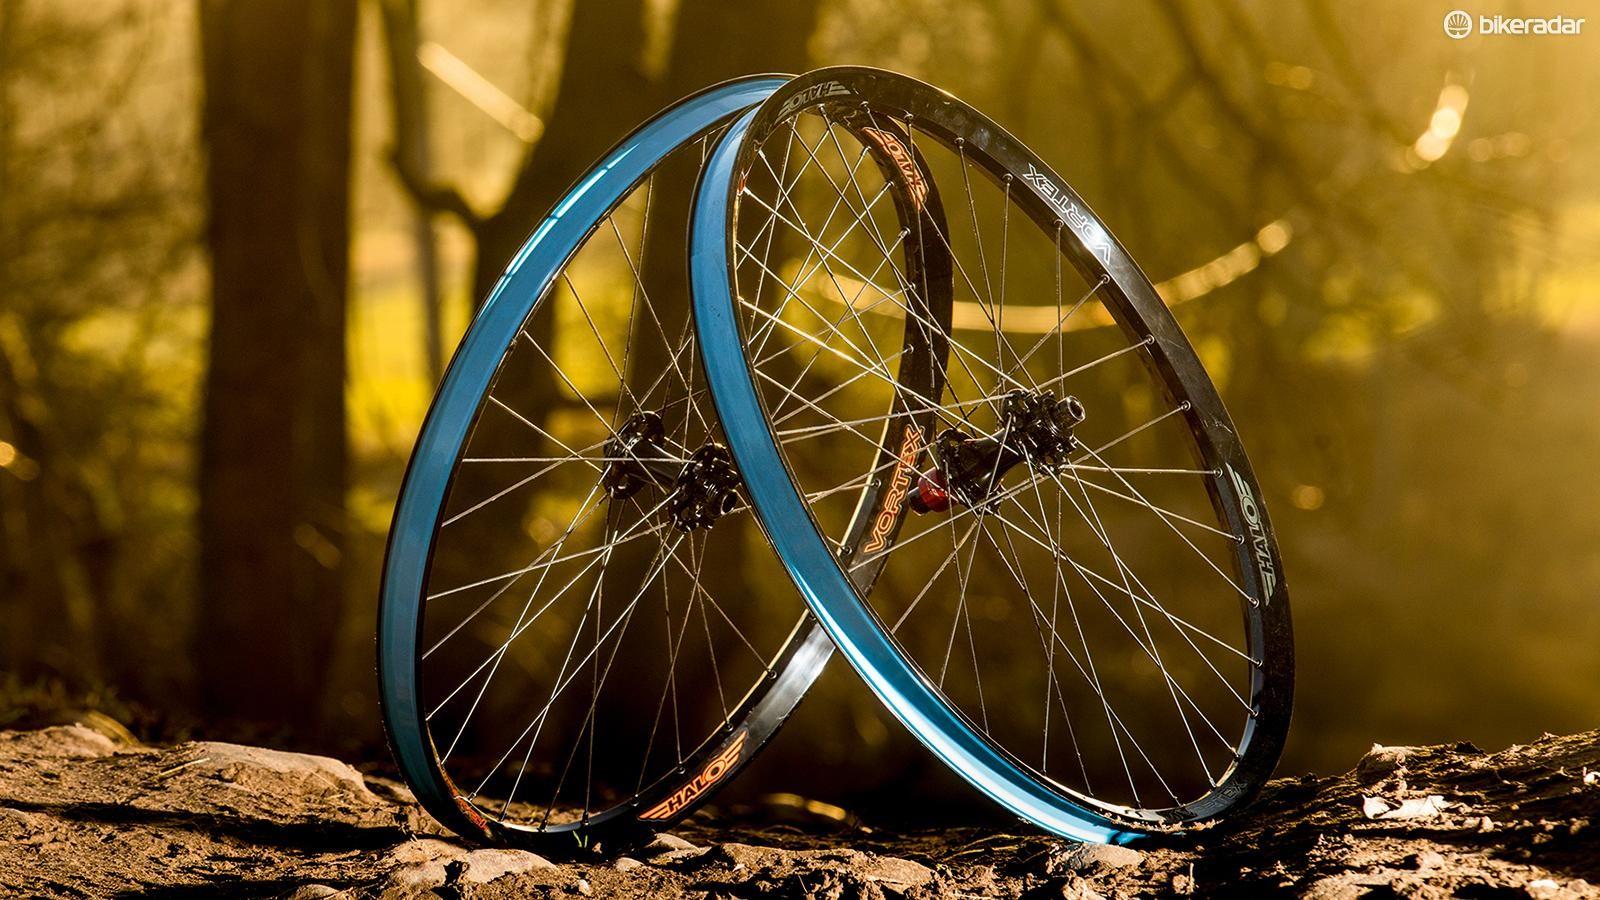 Halo's Vortex 650b wheelset